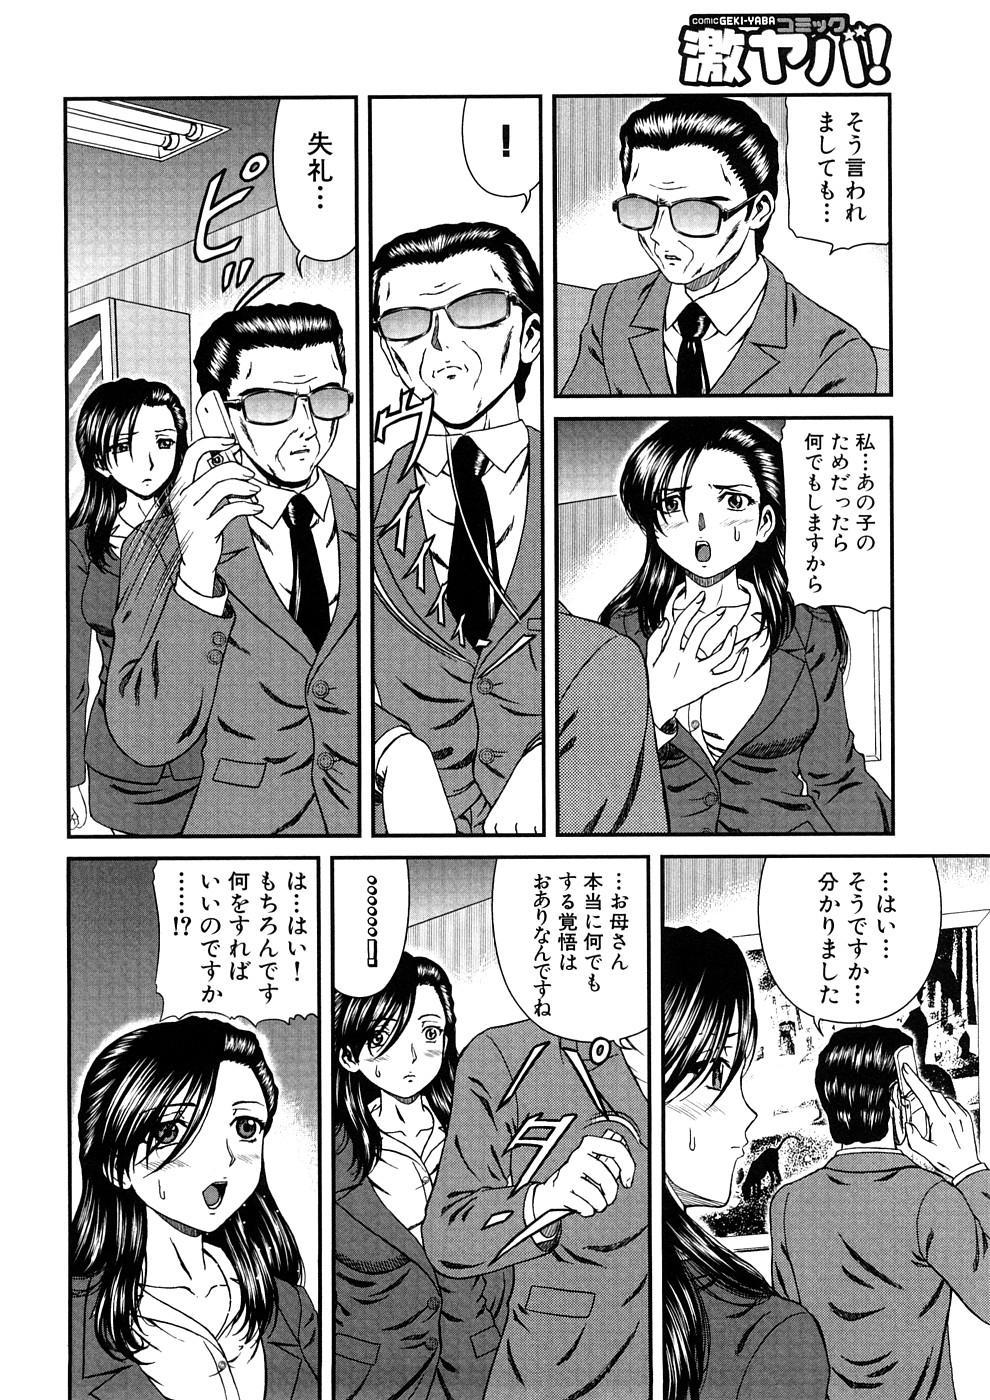 Geki Yaba Anthology Vol. 1 - Naka ni Dashite yo 142